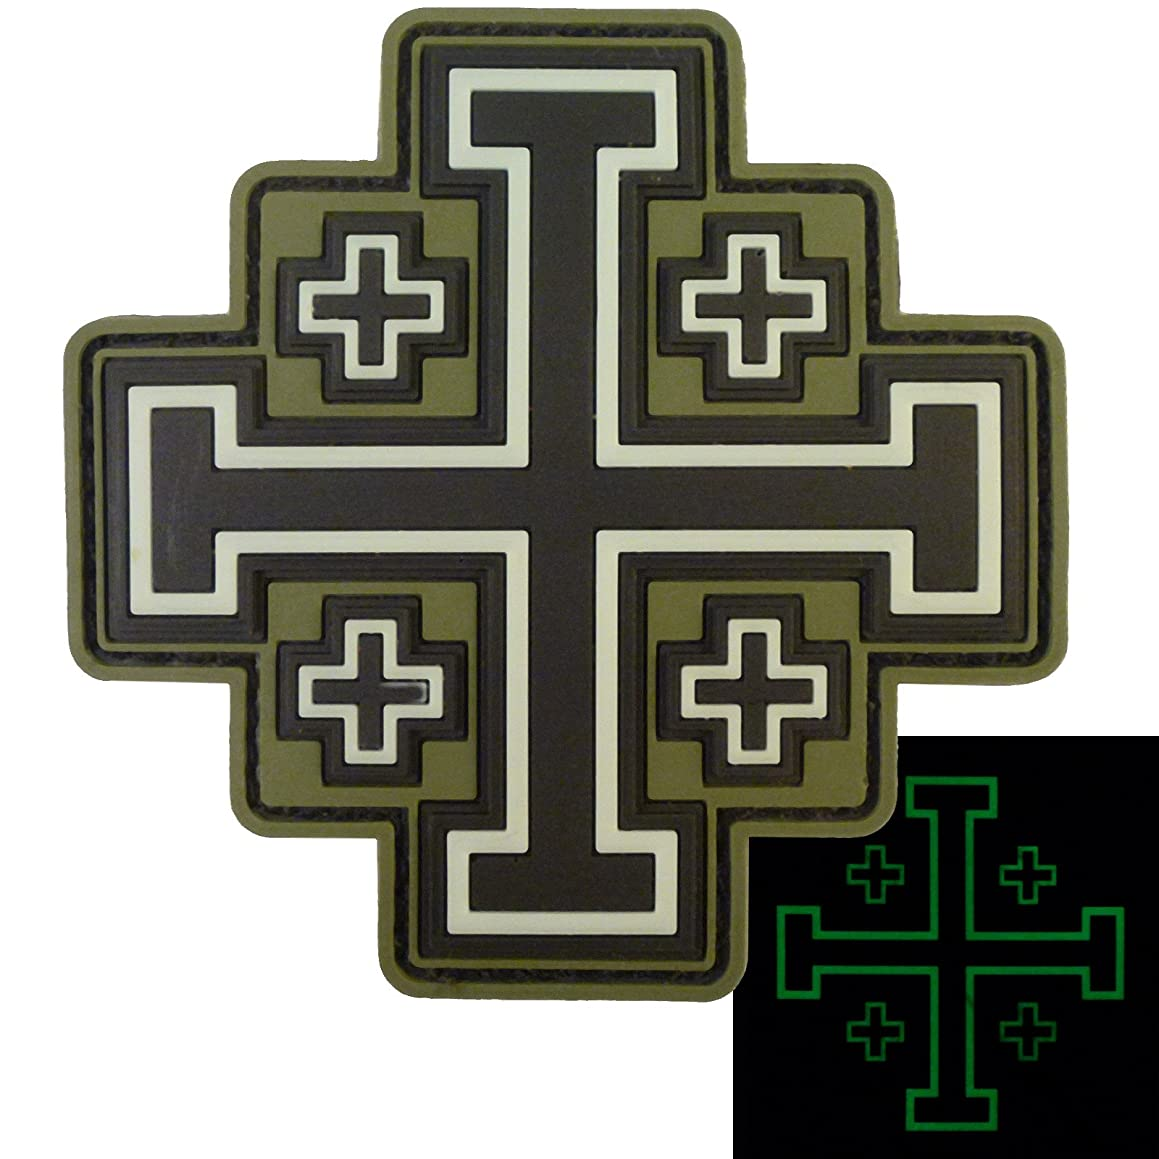 LEGEEON Glow Dark Olive Drab OD Order Holy Sepulchre Jerusalem Cross Crusaders Morale Touch Fastener Patch